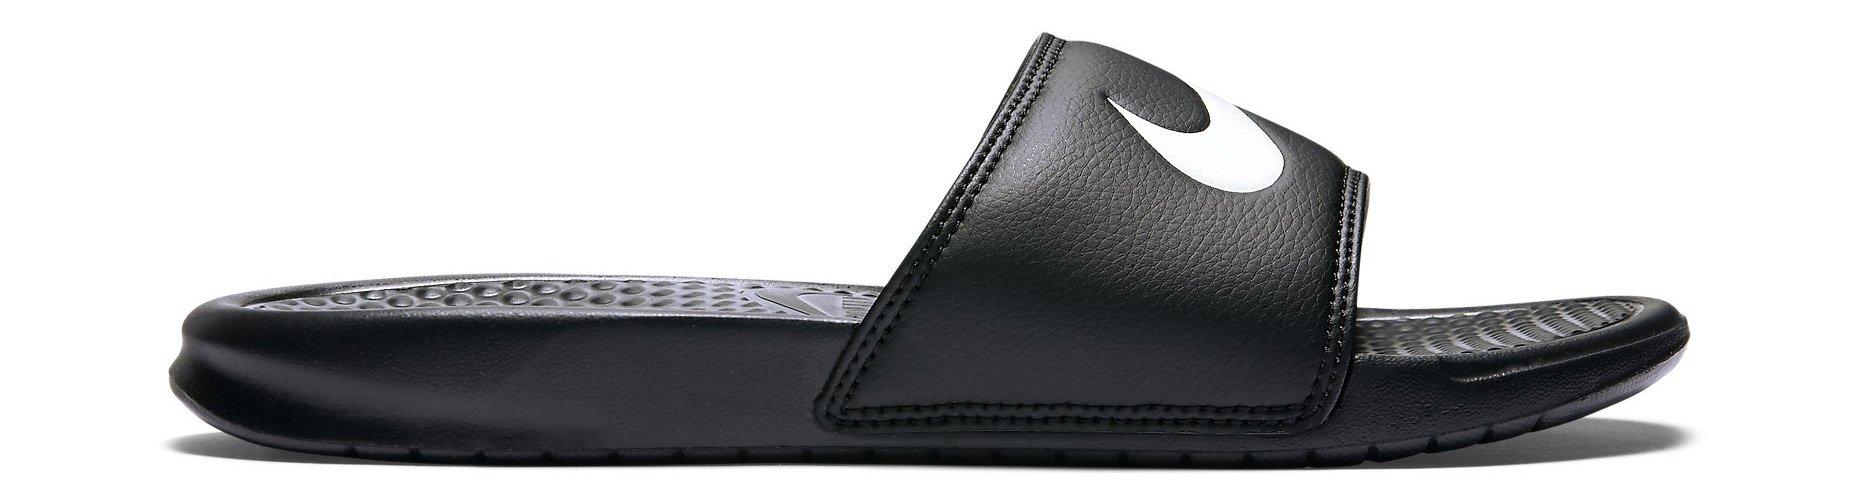 Pantofle Nike Benassi Swoosh